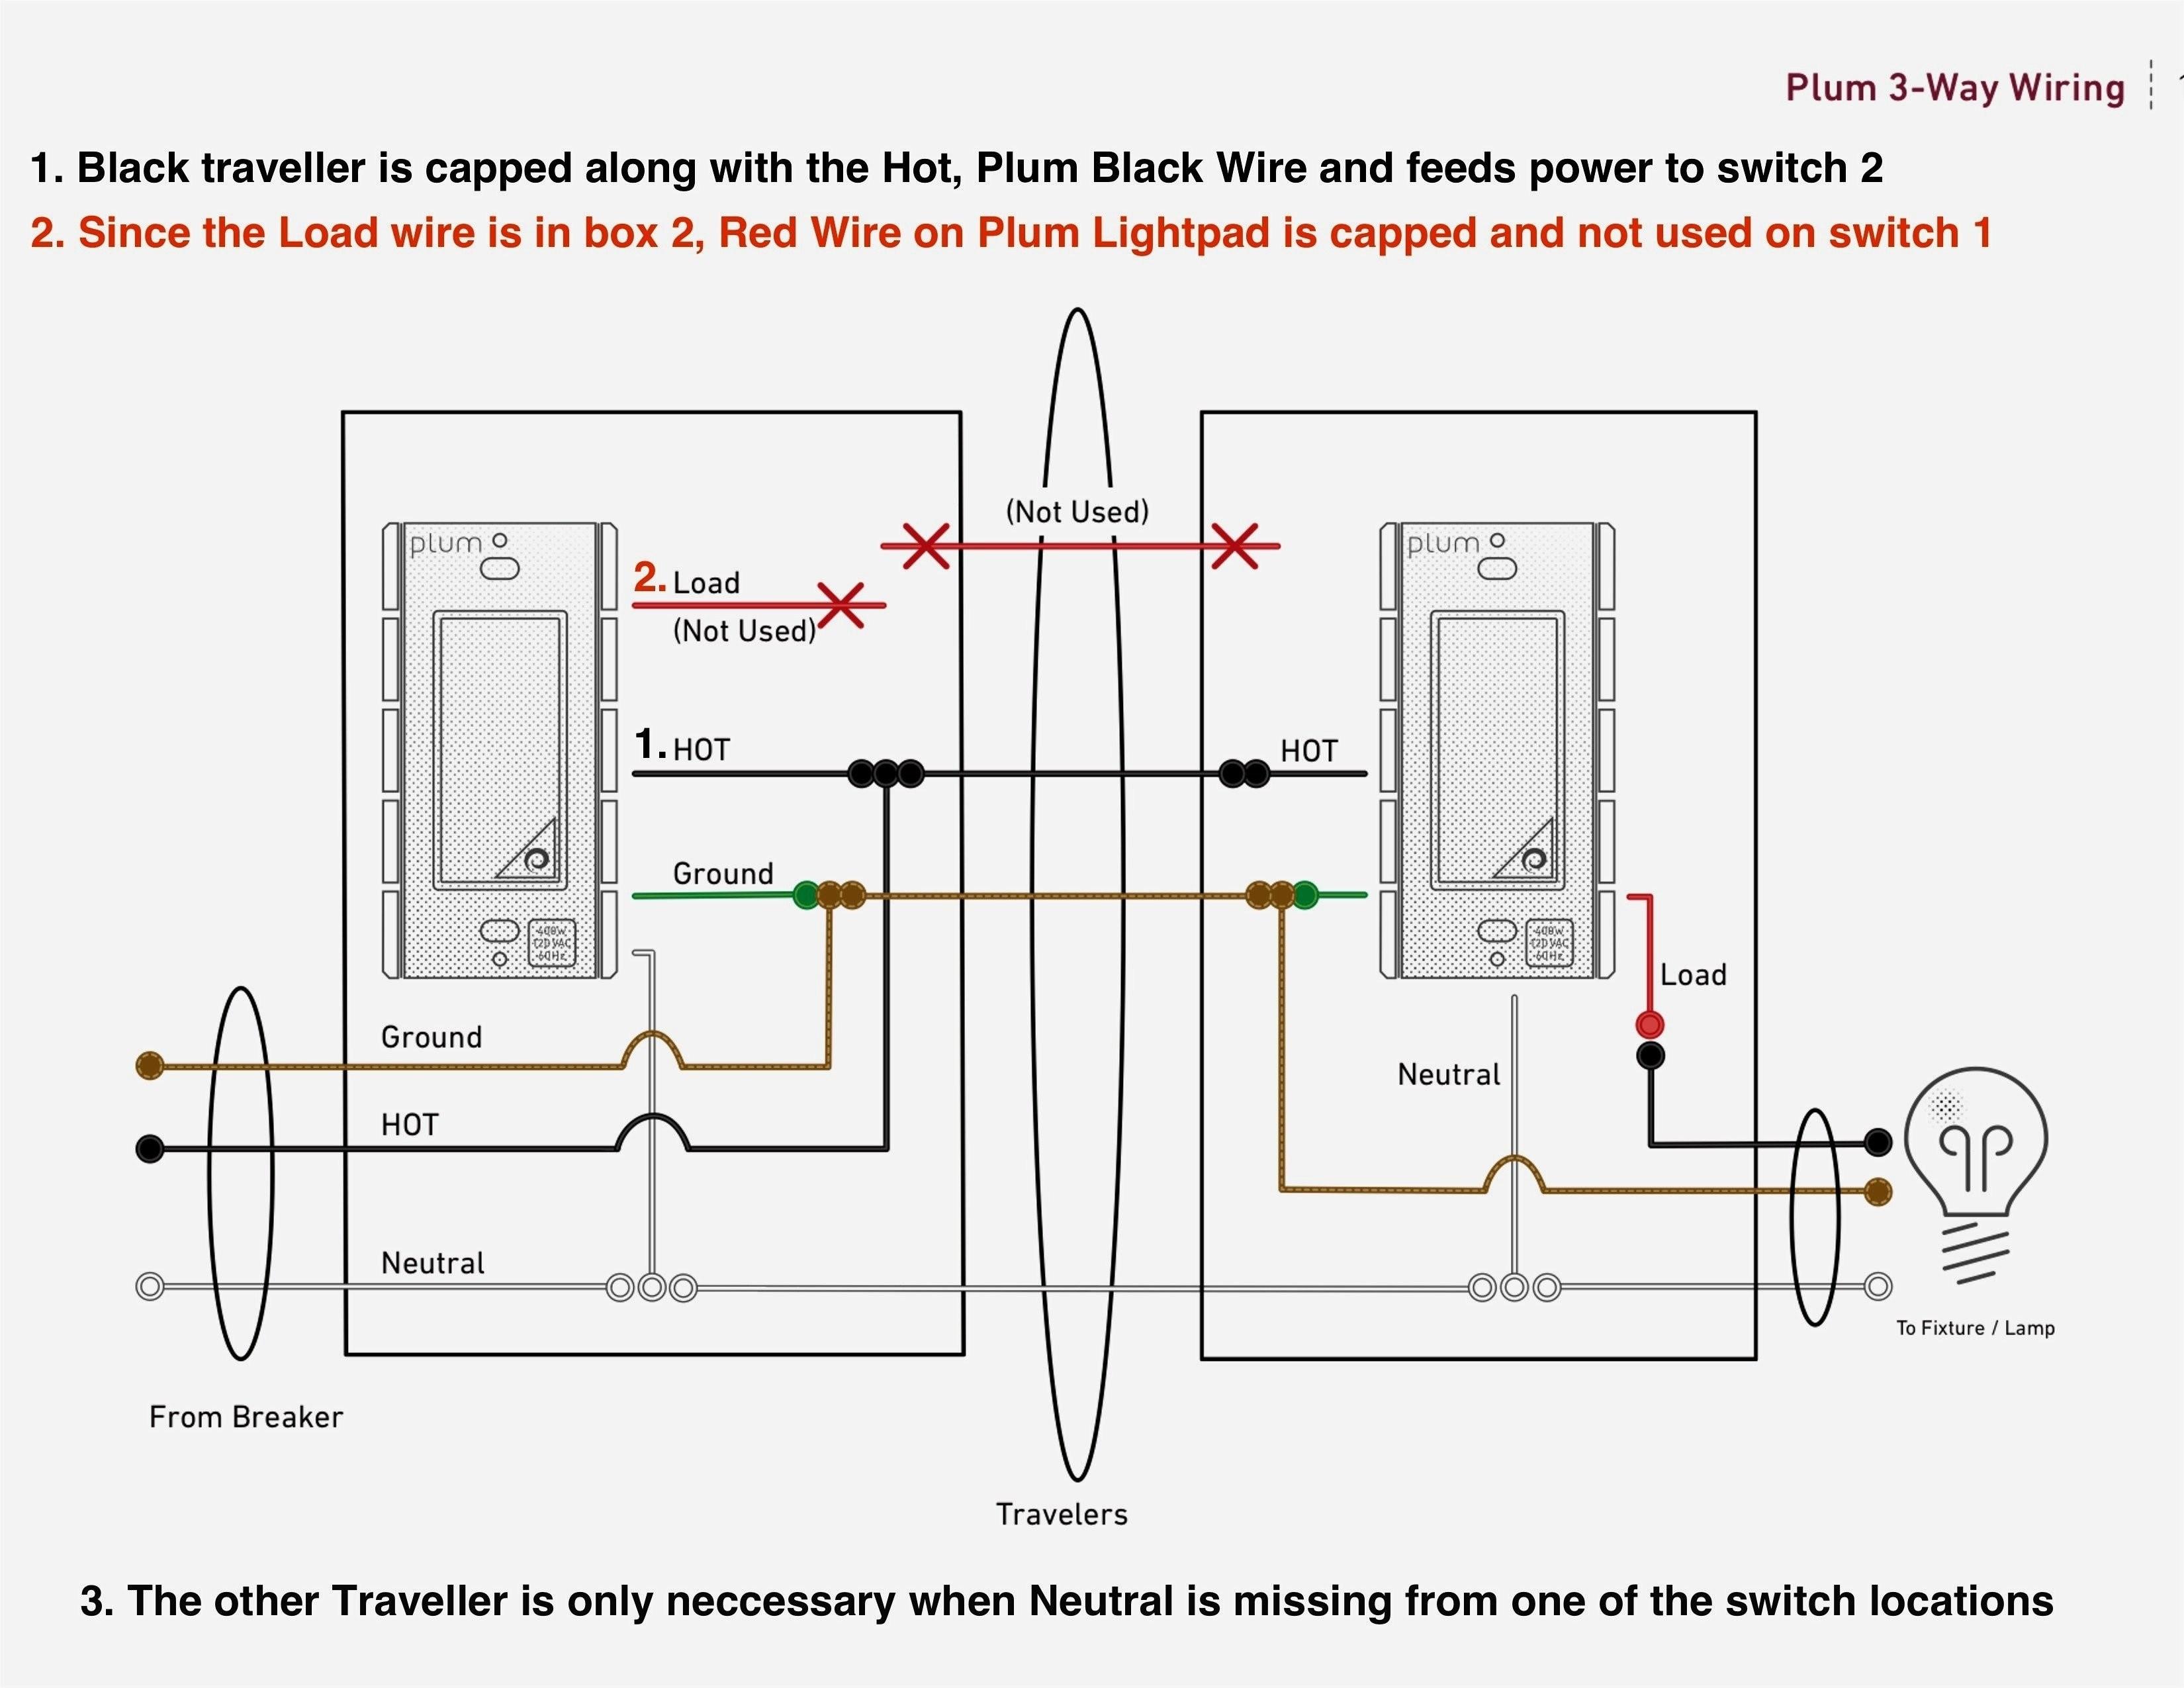 H7Jjl In Leviton 3 Way Switch Wiring Diagram | Philteg.in - Leviton 3 Way Dimmer Switch Wiring Diagram